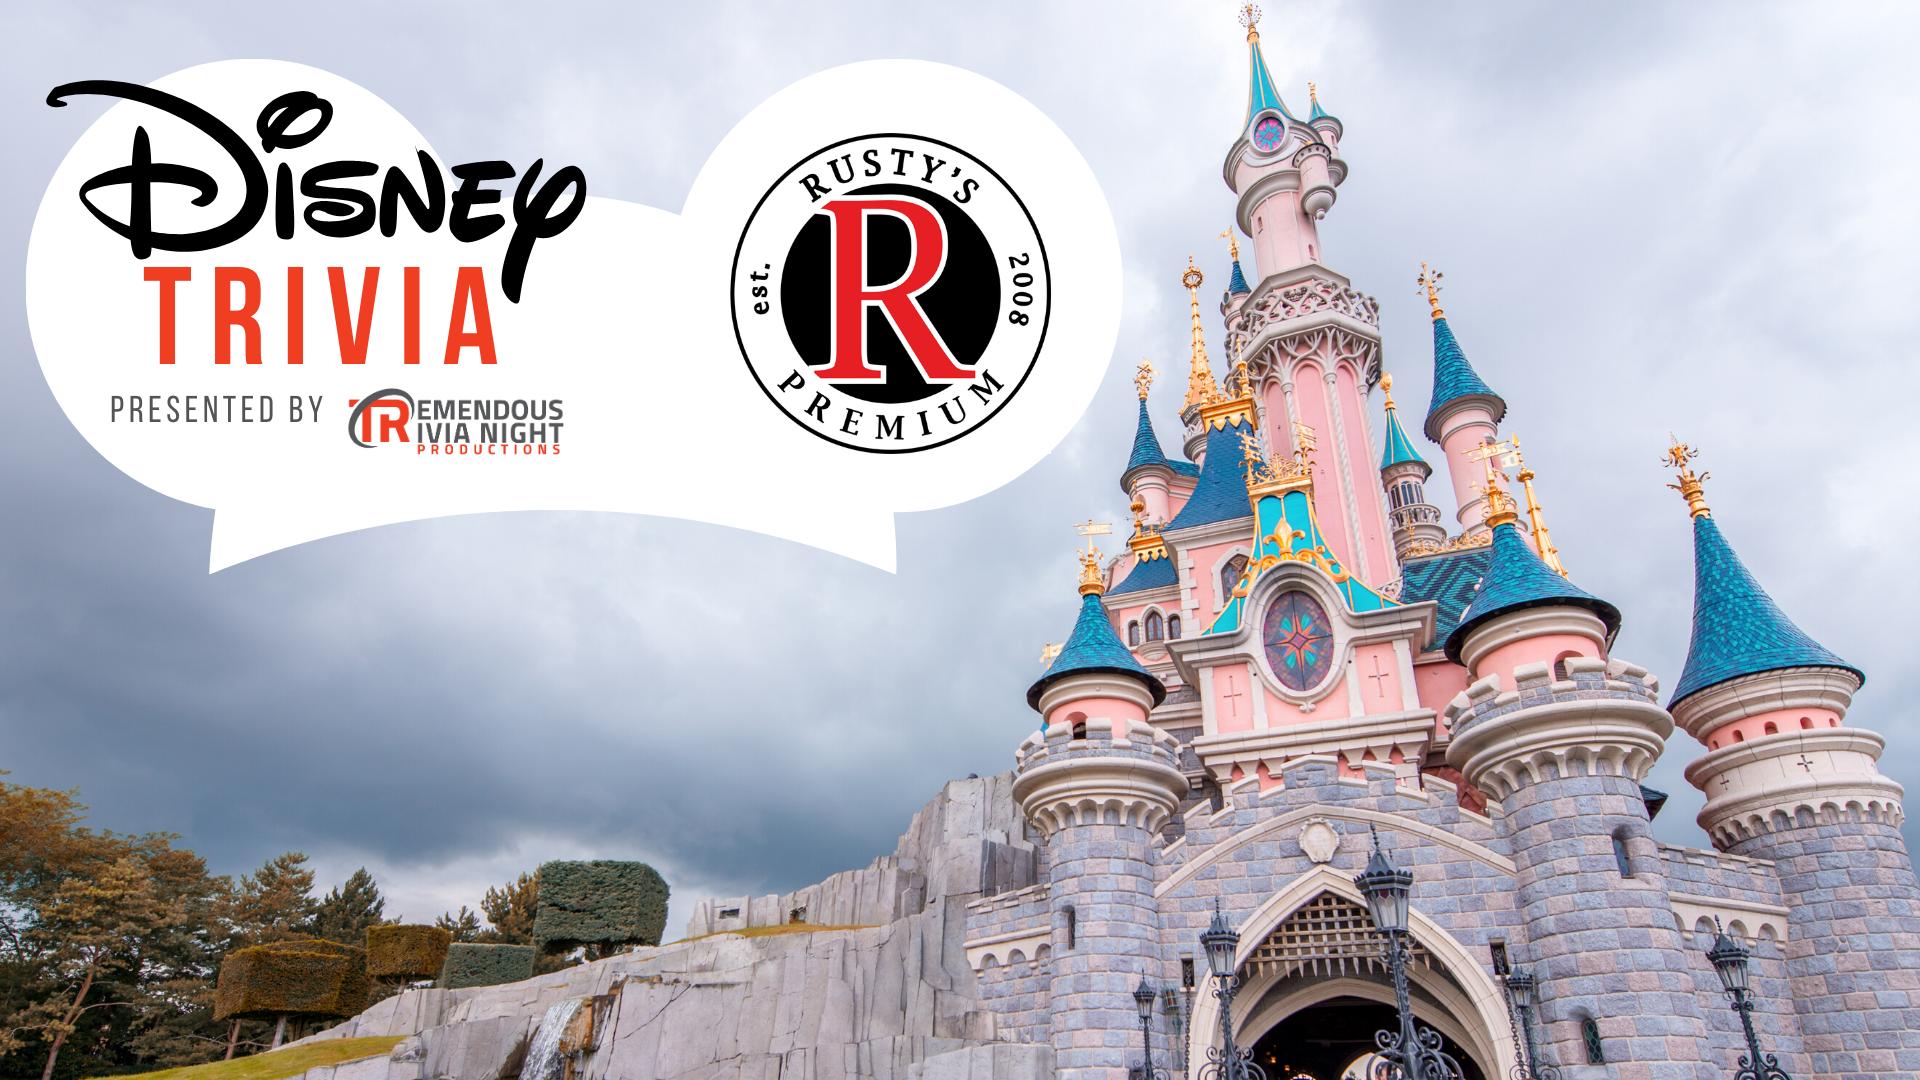 Rustys Disney trivia